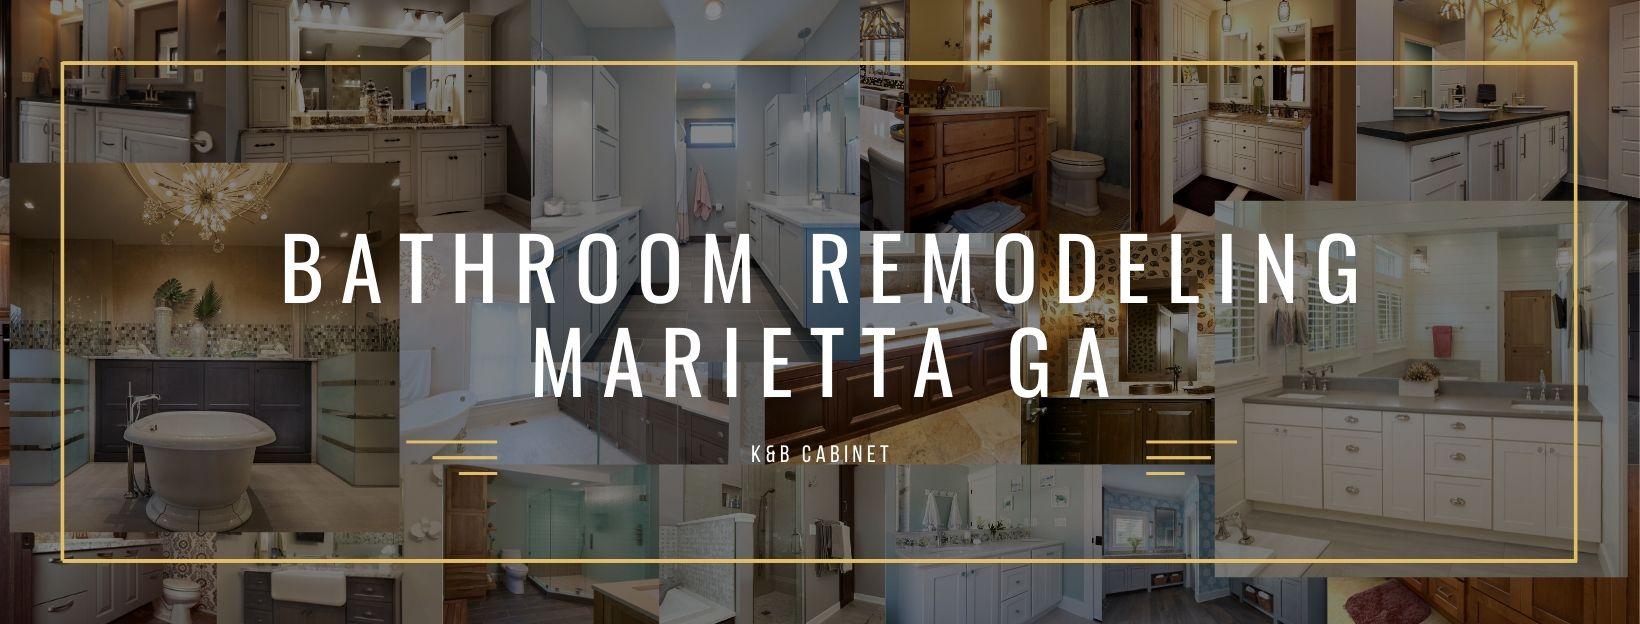 Bathroom Remodeling Marietta GA